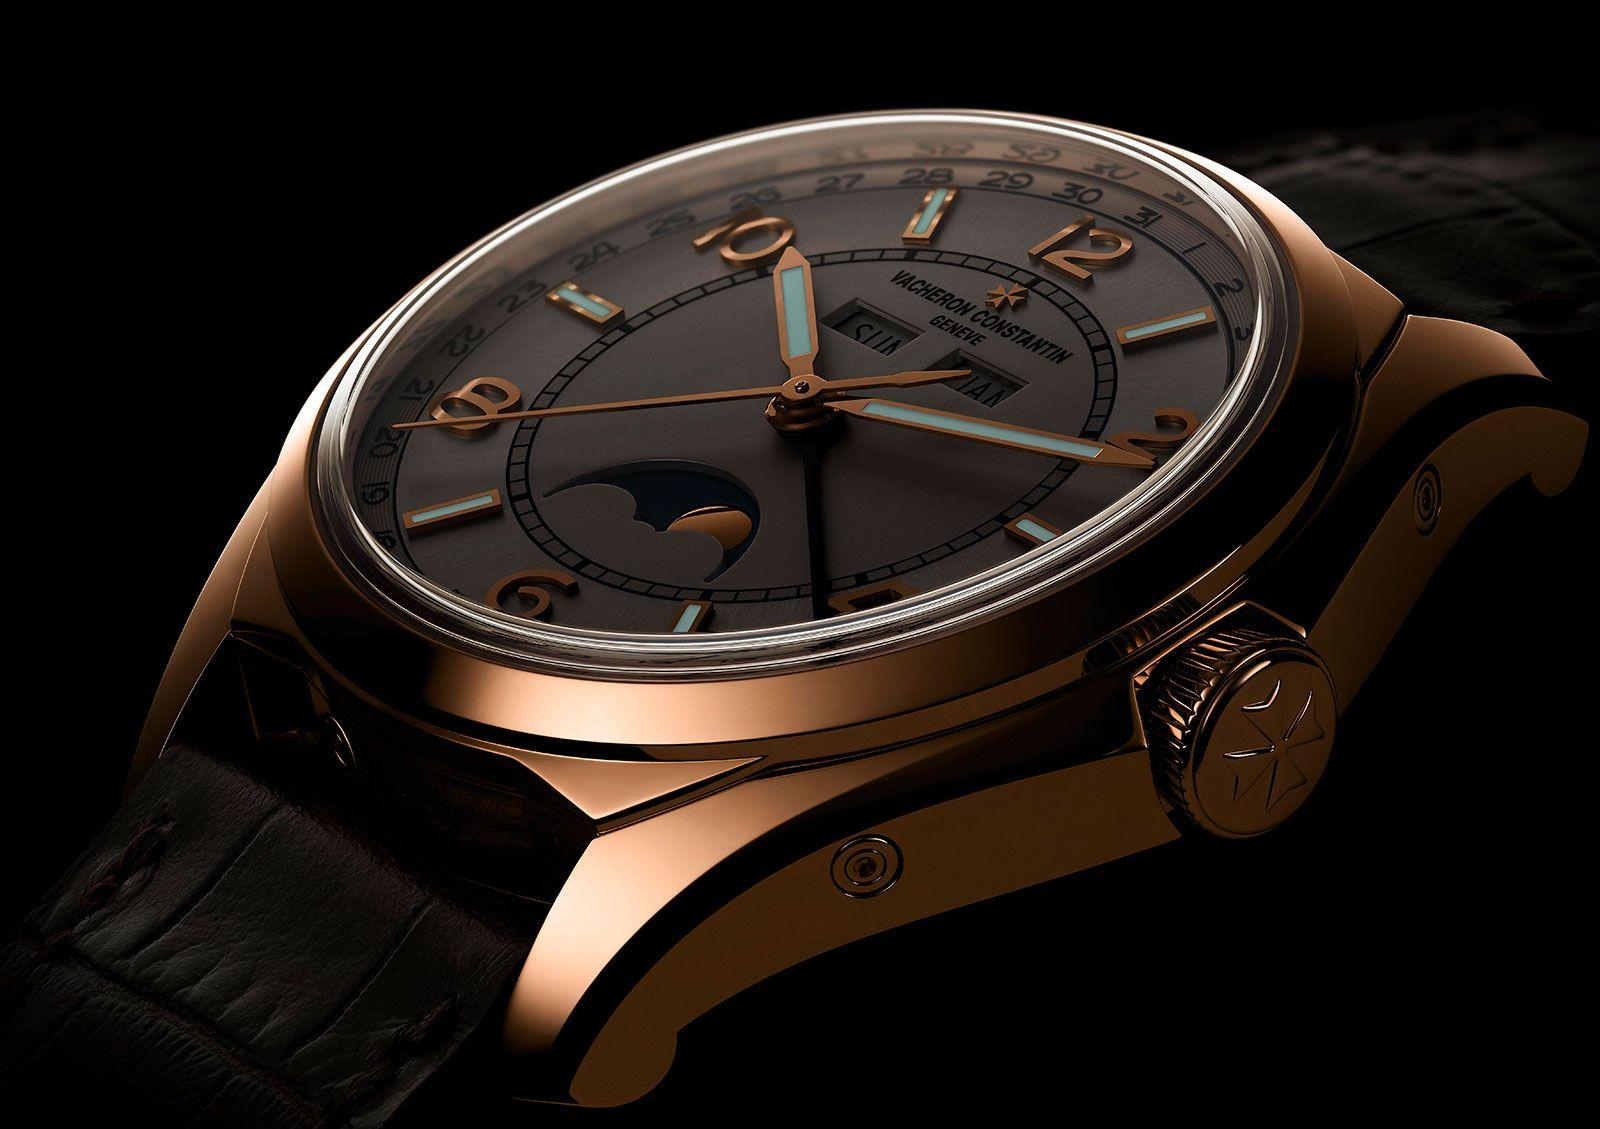 Vacheron Constantin Fiftysix Complete Calendar Gold Affordable Watches Vacheron Constantin Watch Design